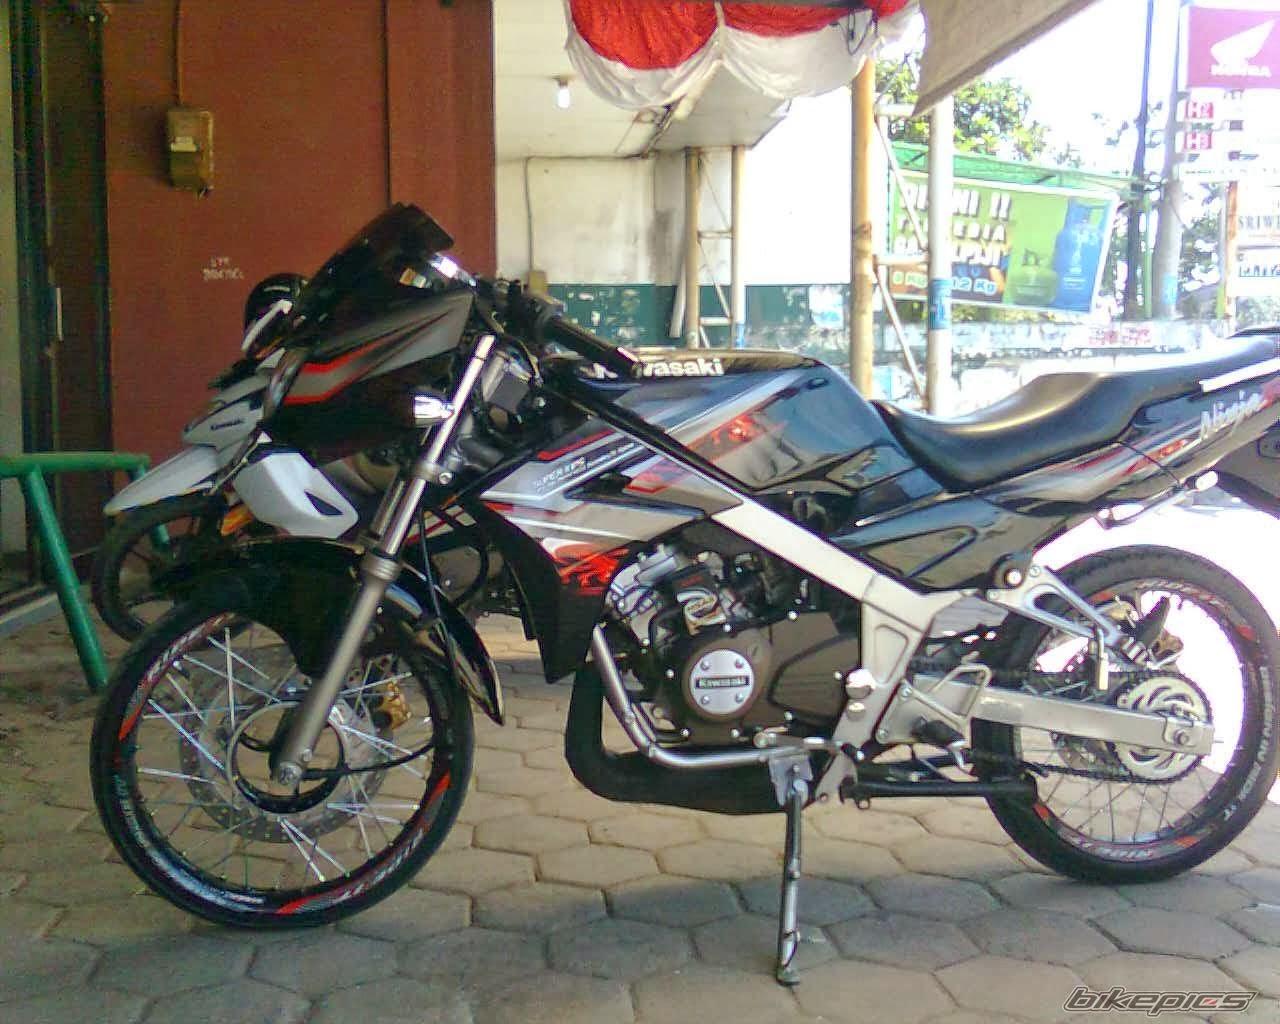 Koleksi 71 Modifikasi Motor Ninja Ss Airbrush Terupdate Teka